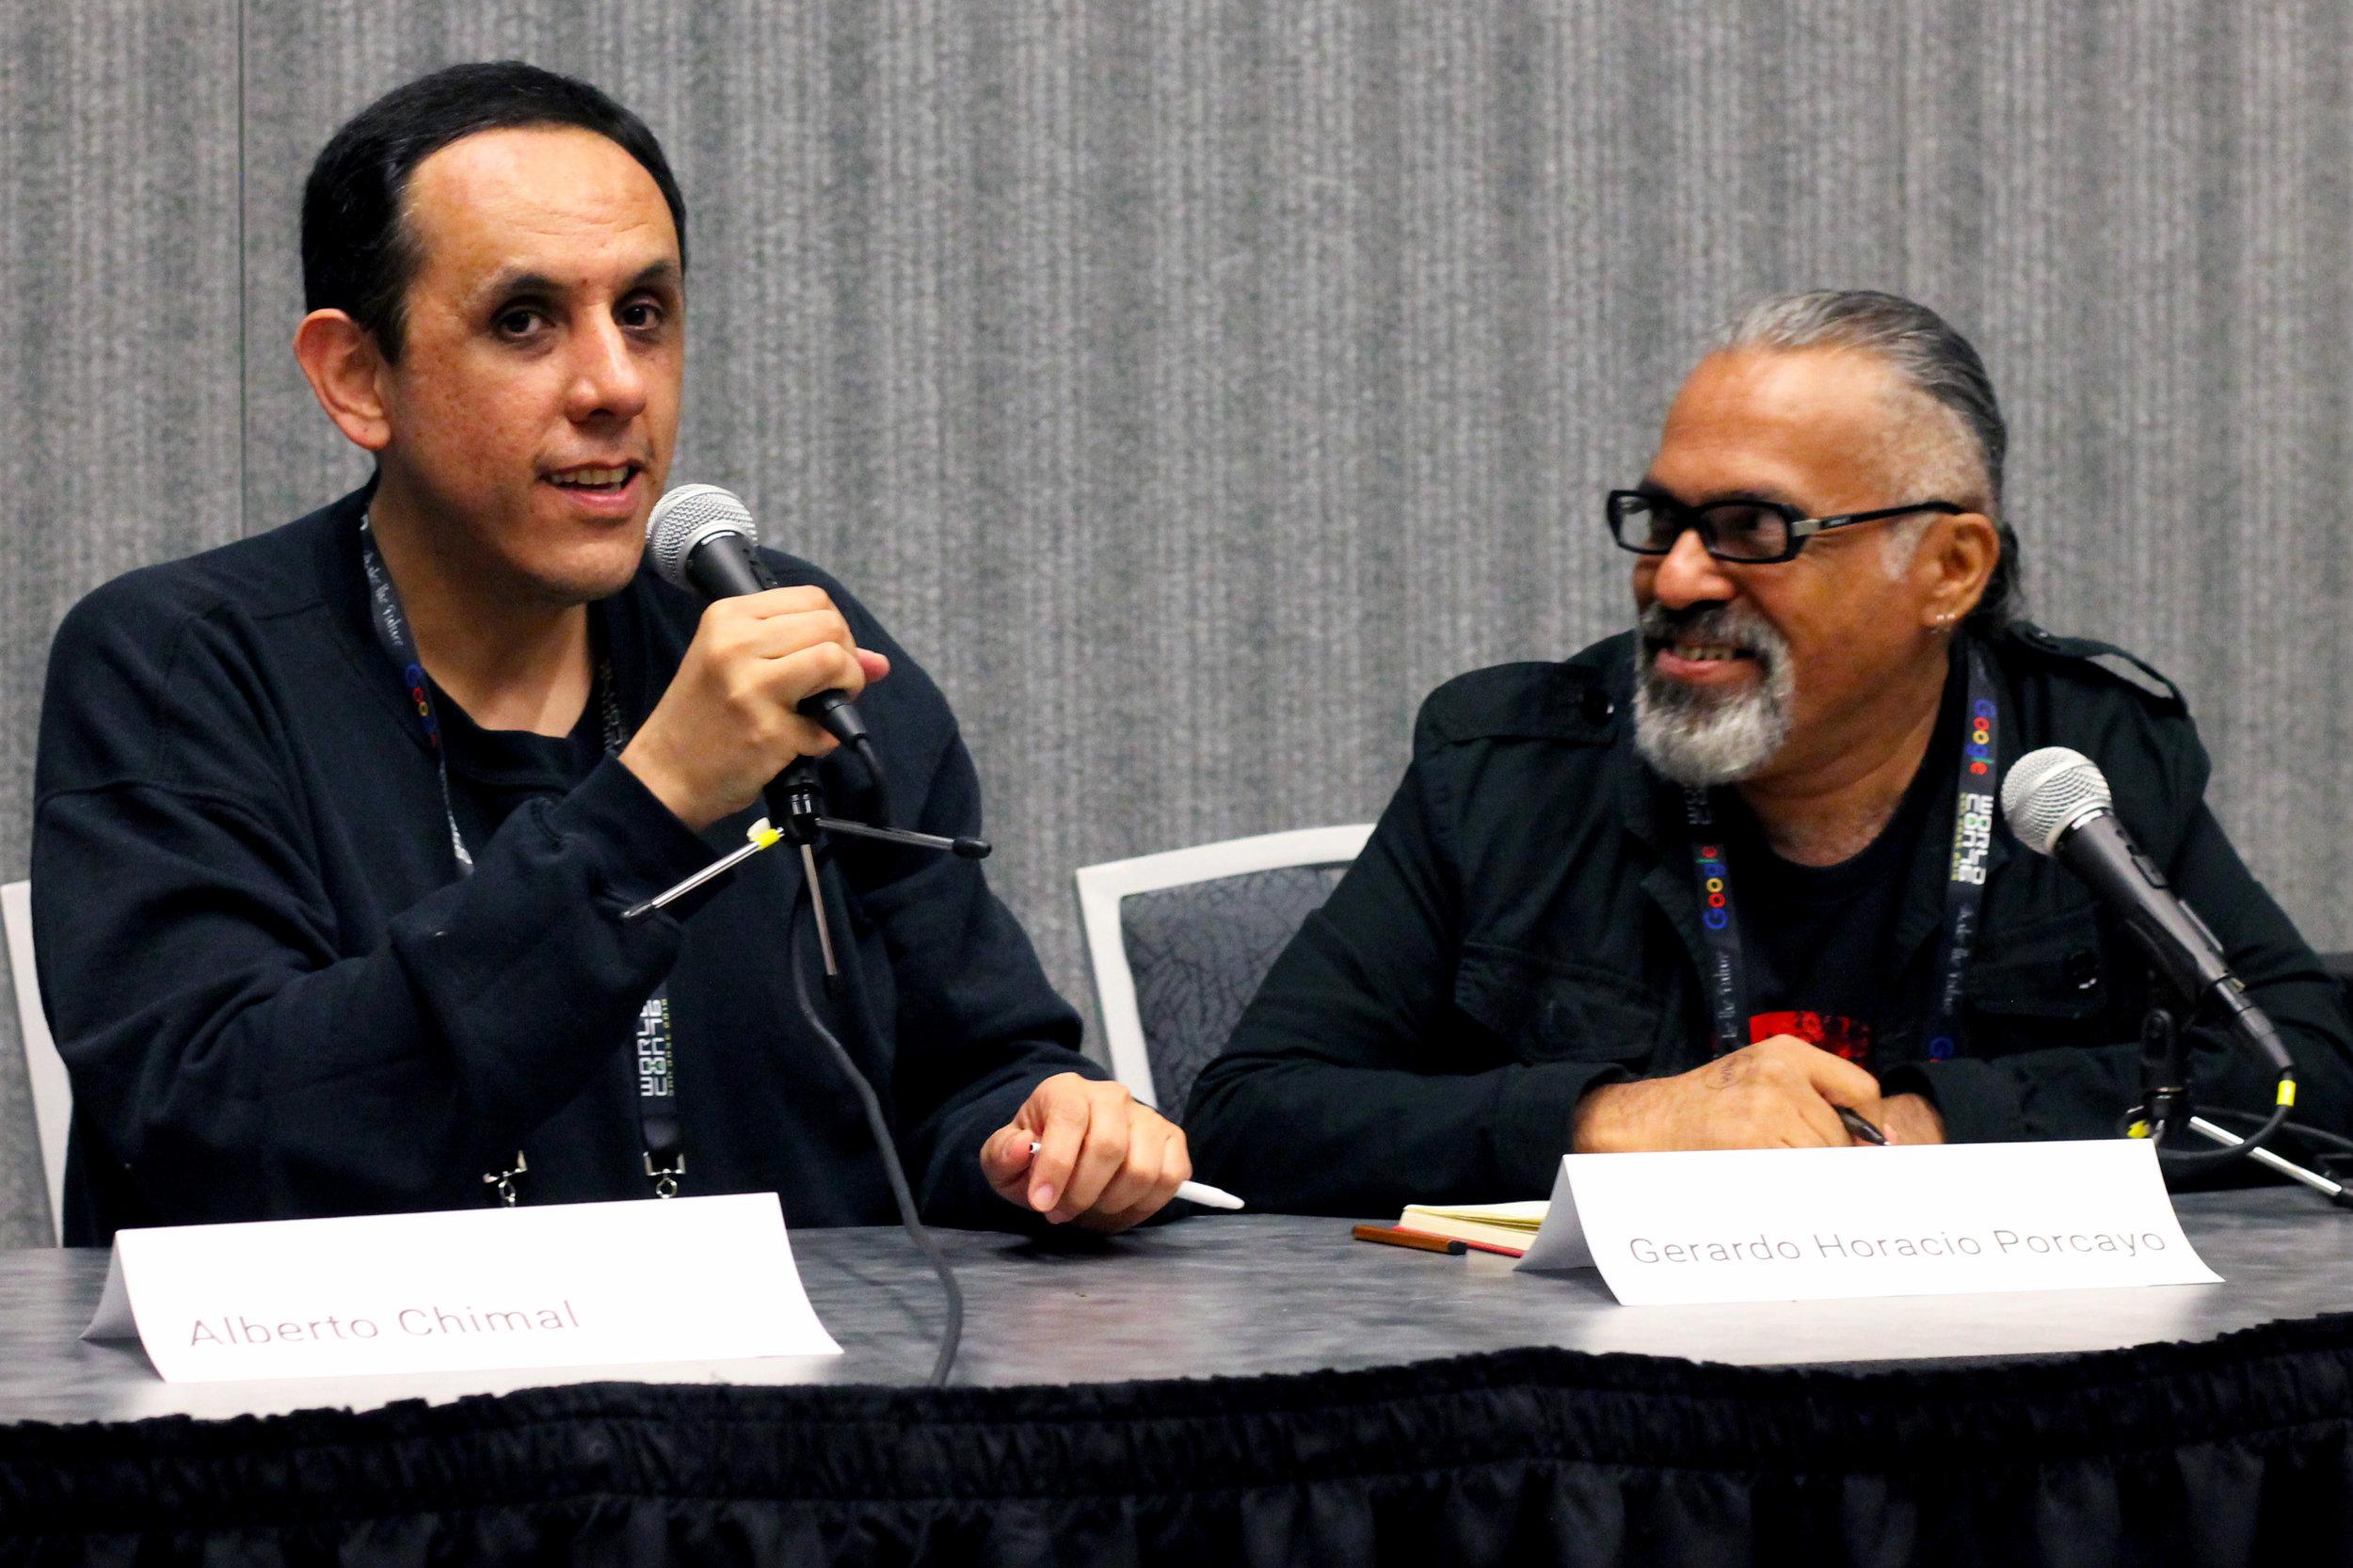 Alberto Chimal and Gerardo Horacio Porcayo at the history of Mexicanx Sci-Fi panel (Sent by Julia Rios; photo by Kateryna Barnes)